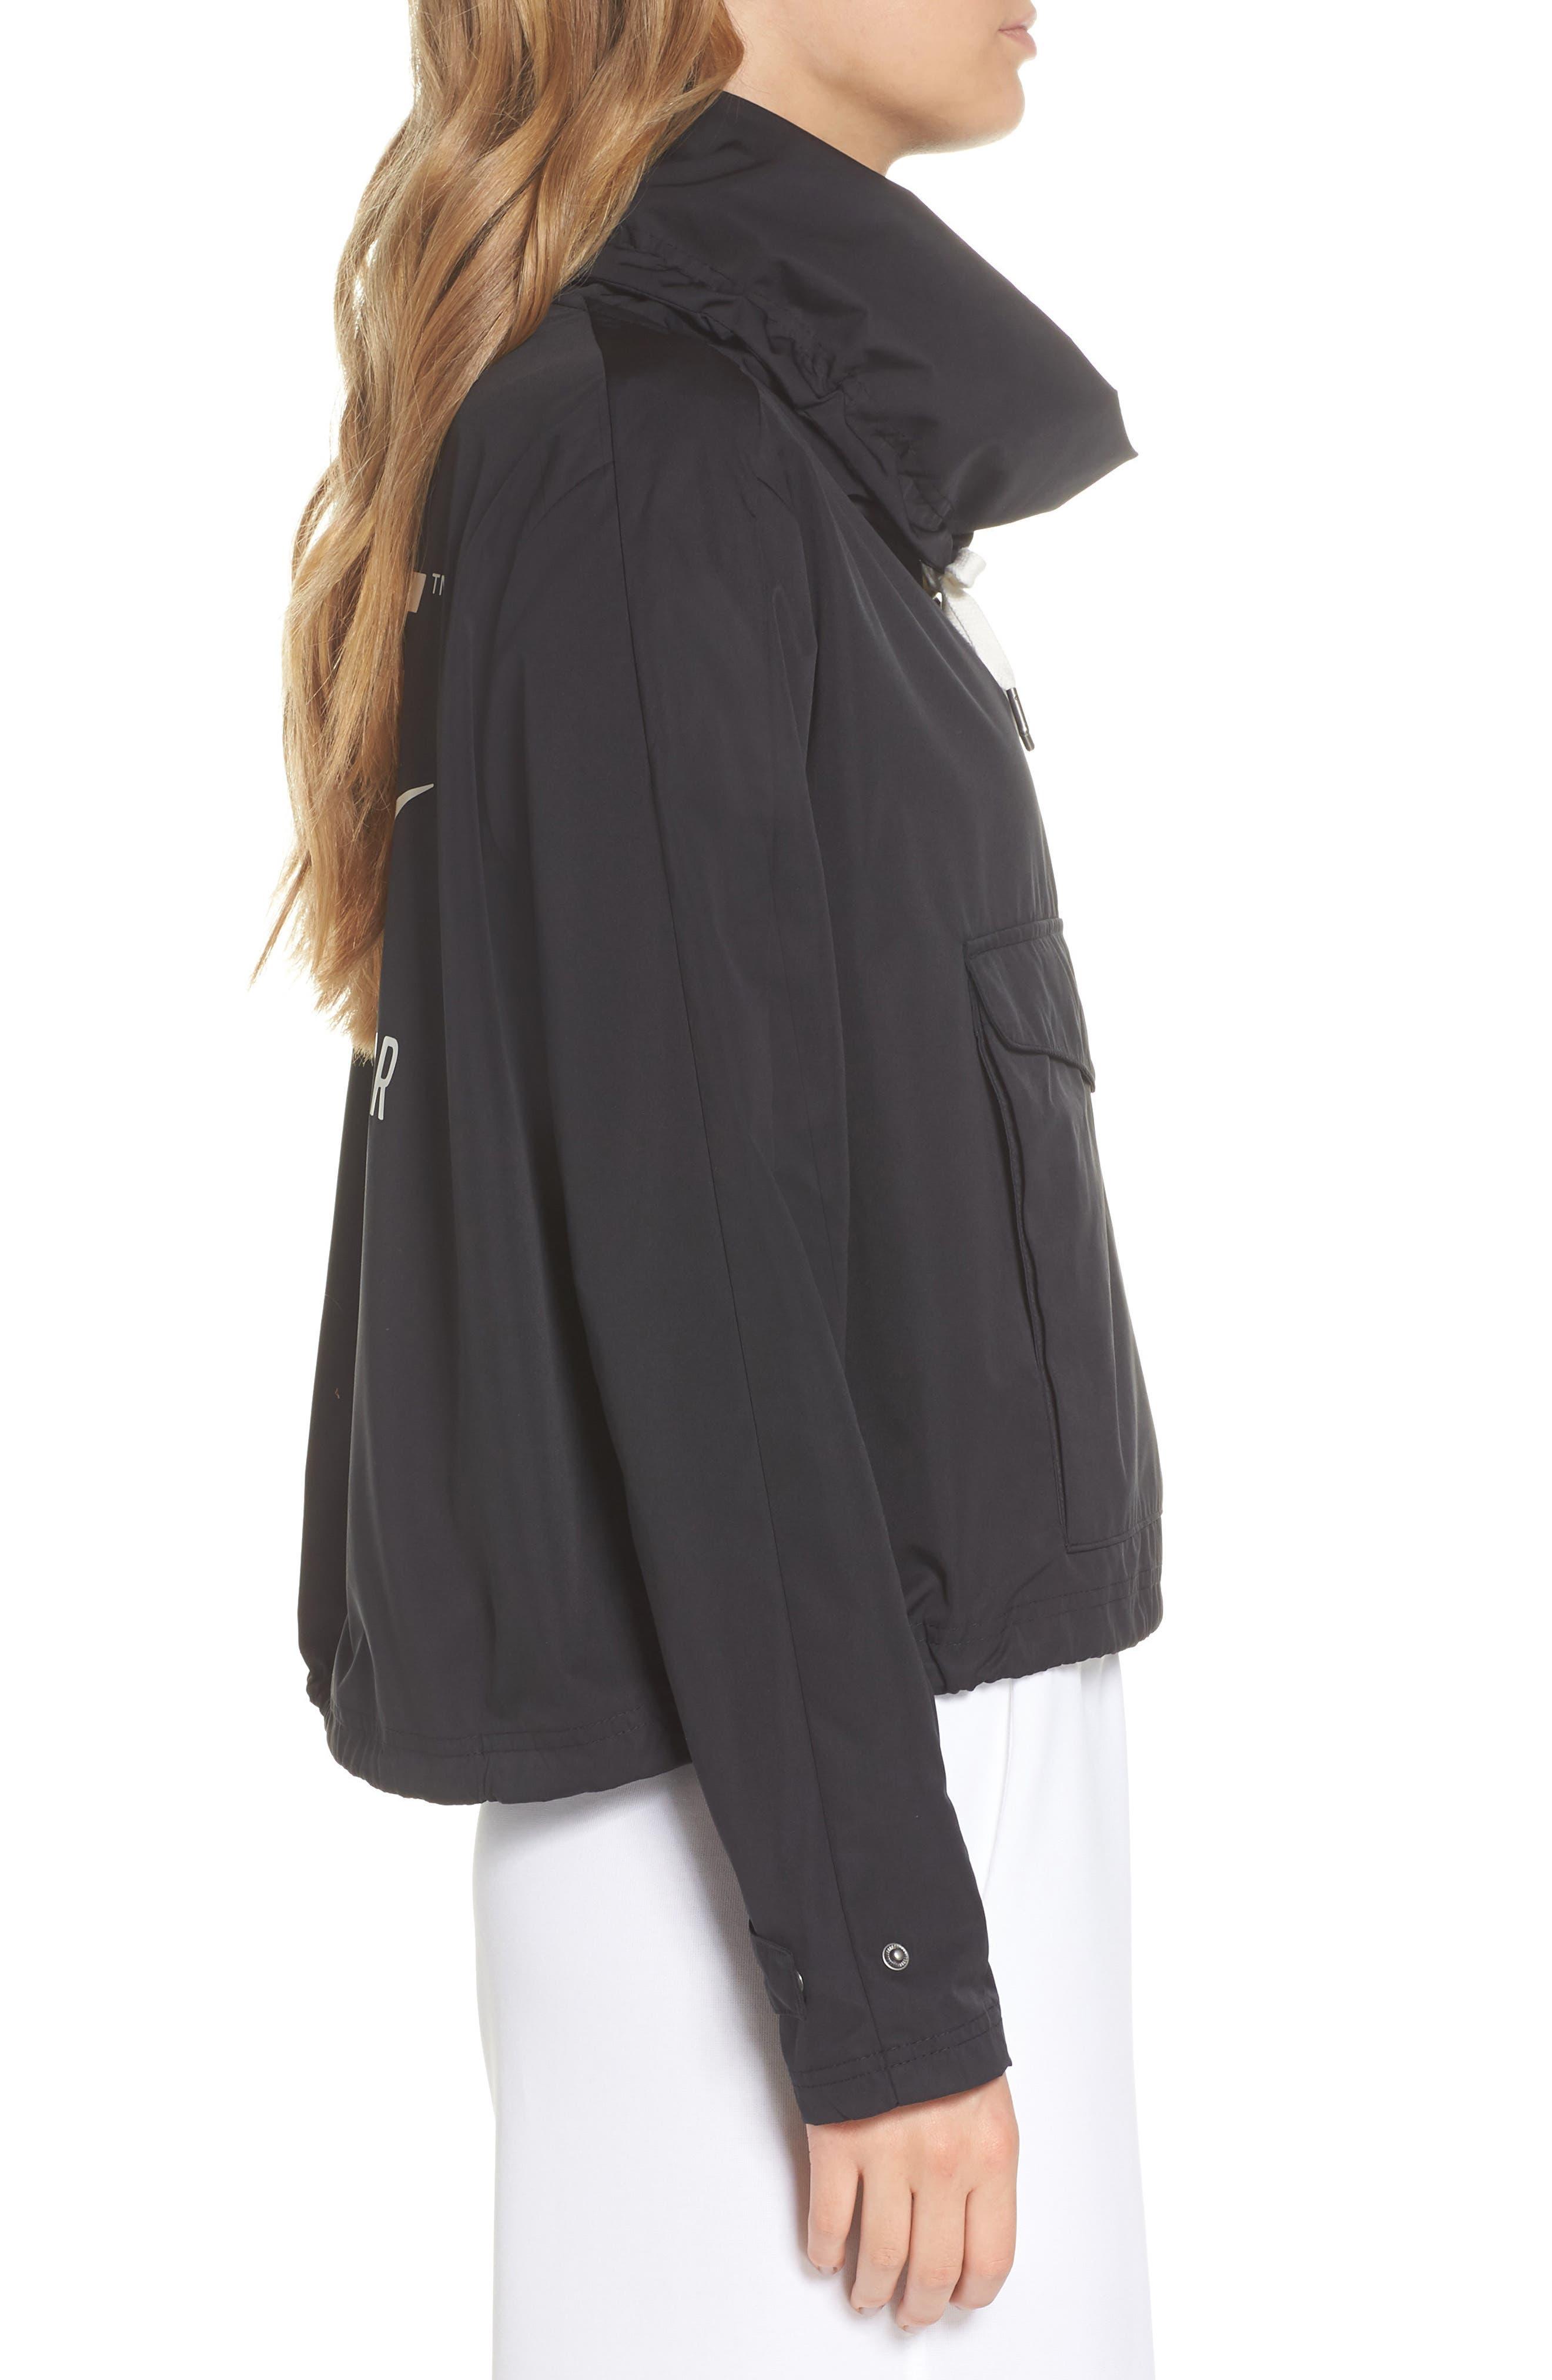 Sportswear Archive Jacket,                             Alternate thumbnail 3, color,                             Black/ Black